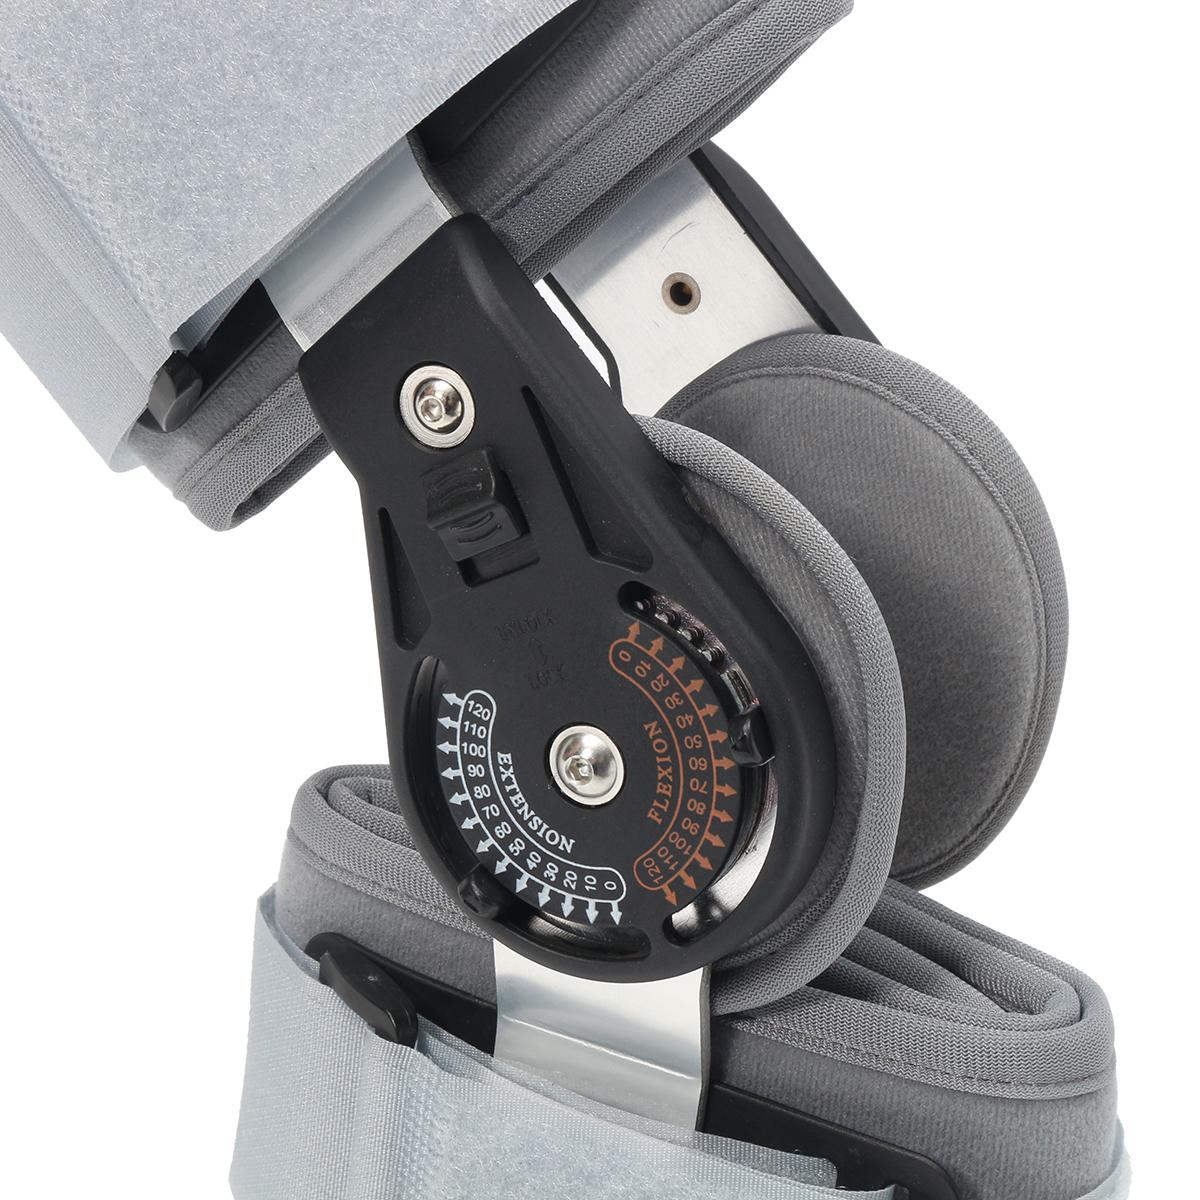 Medical Grade 0-120 Adjustable Hinged Knee Leg Brace Support & Protect Knee Bracket